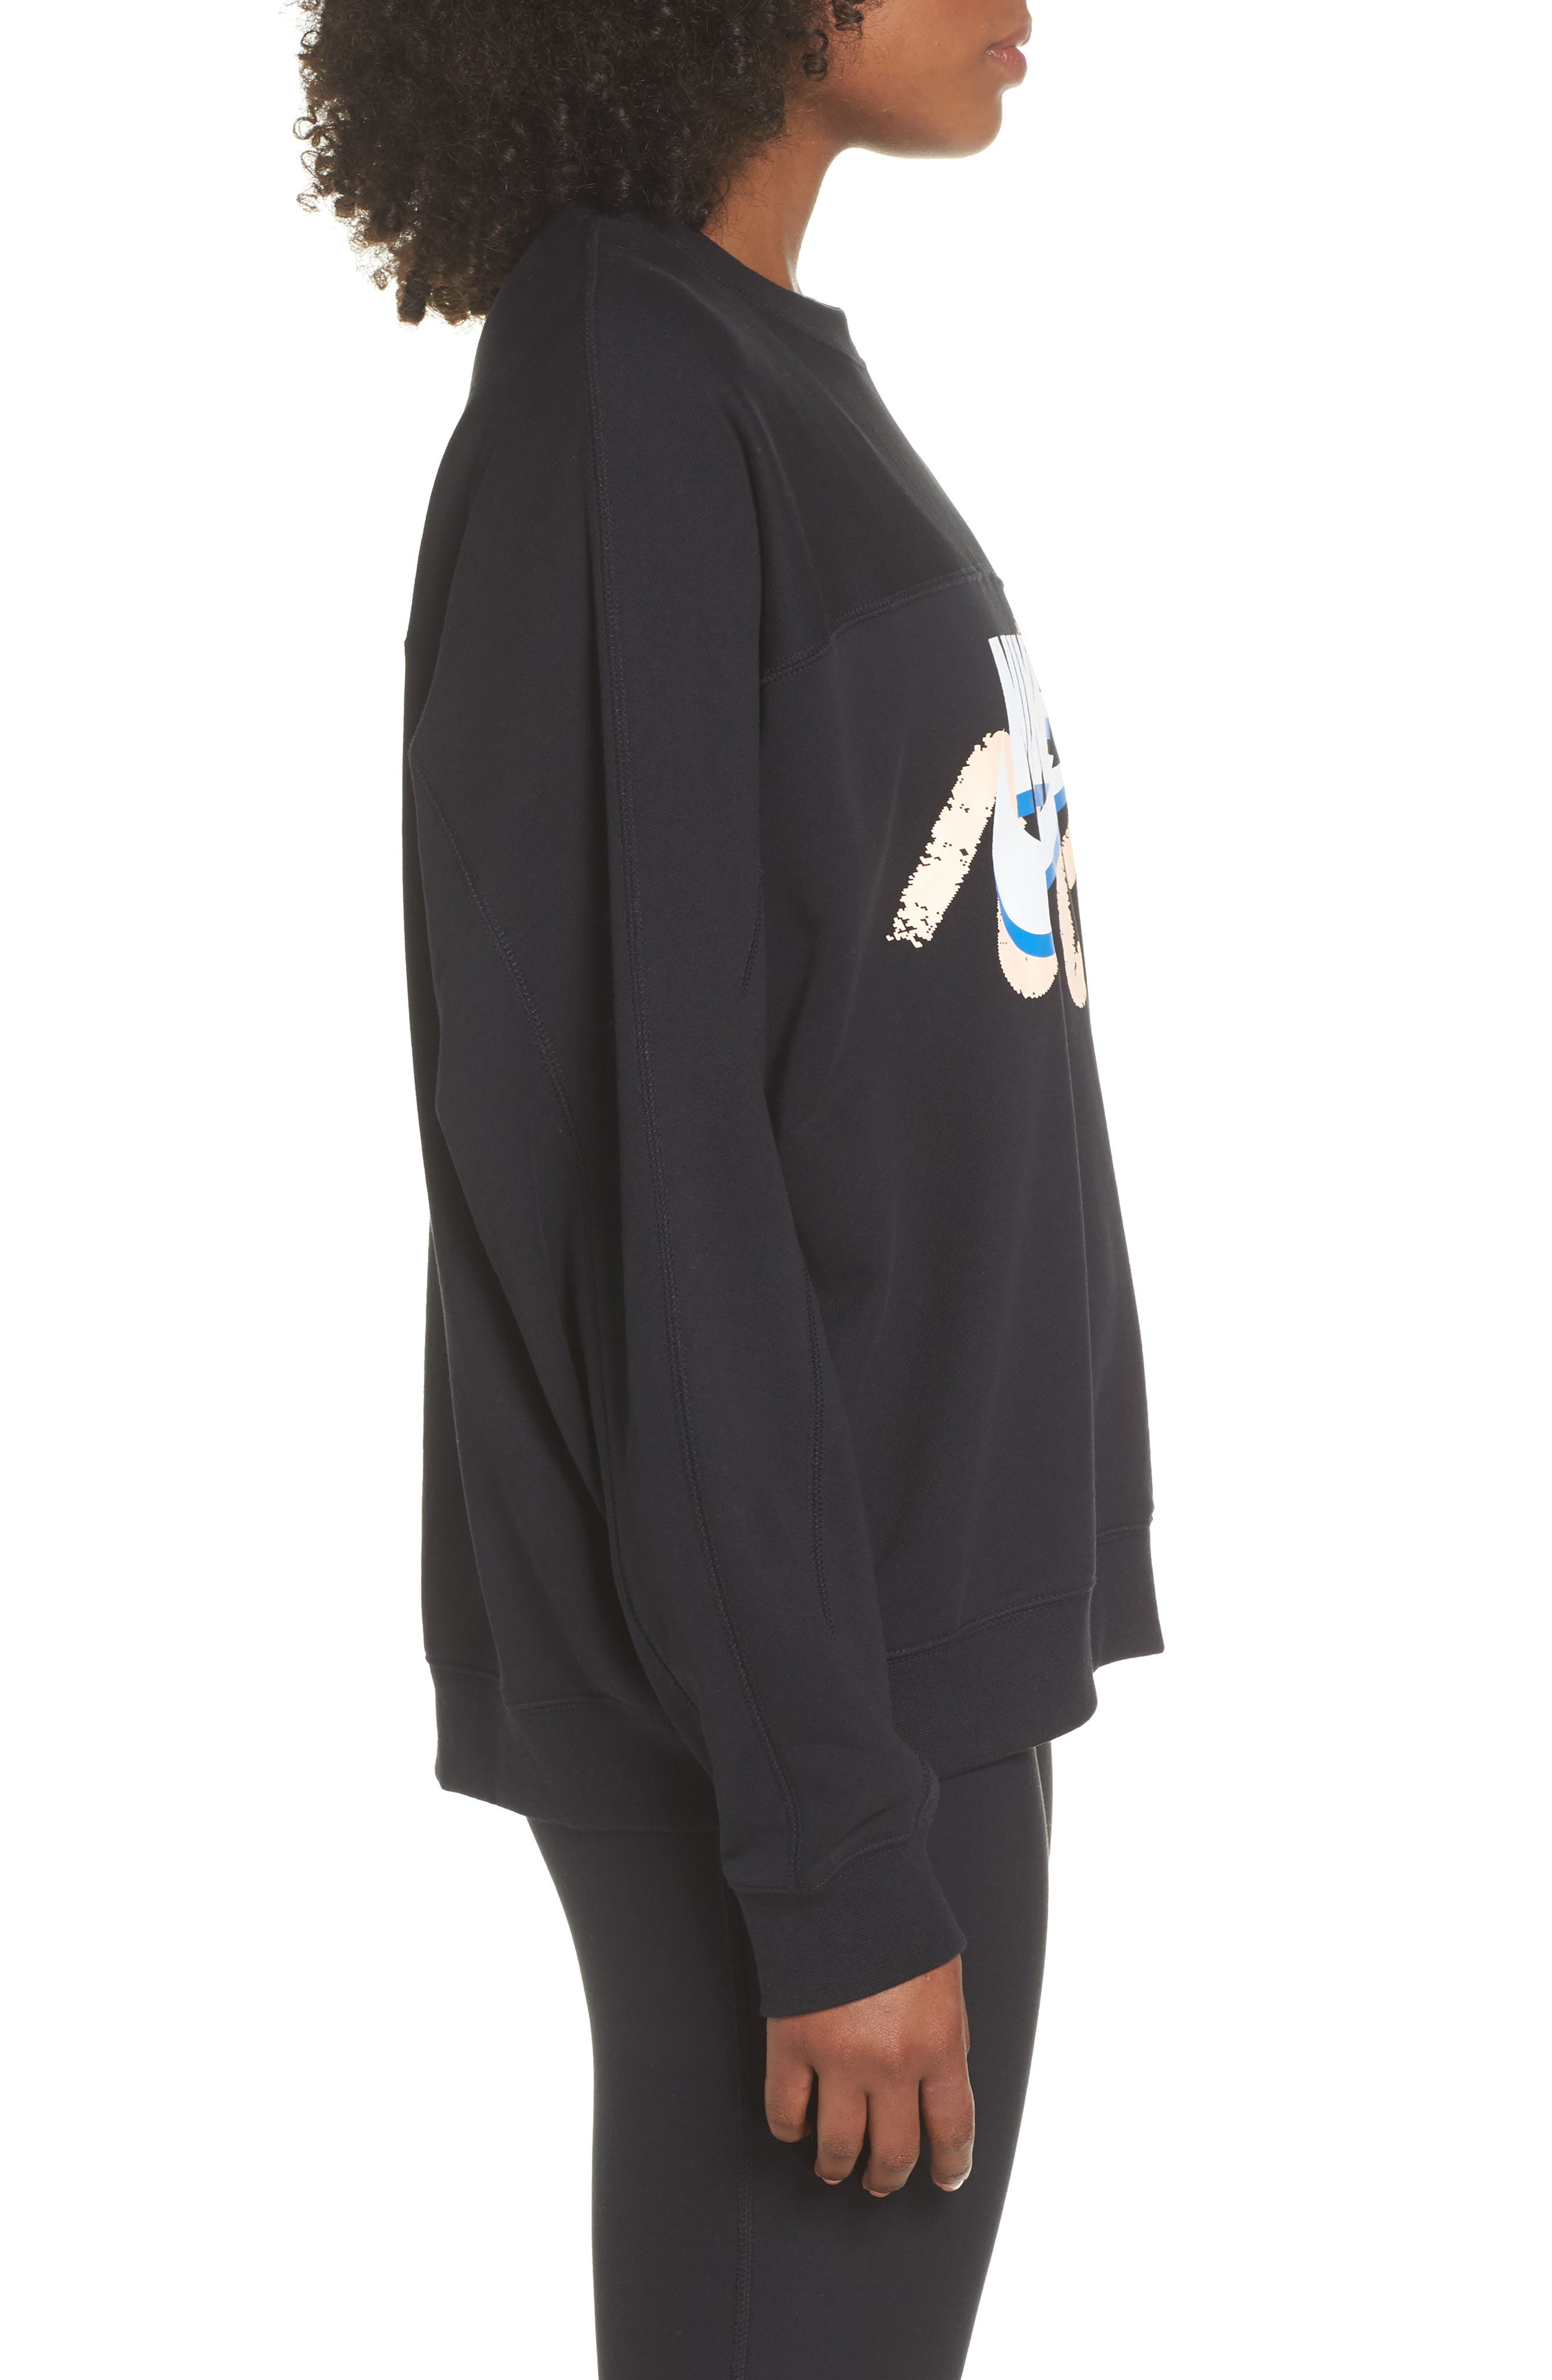 Archive Sweatshirt,                             Alternate thumbnail 3, color,                             BLACK/ BLACK/ BLACK